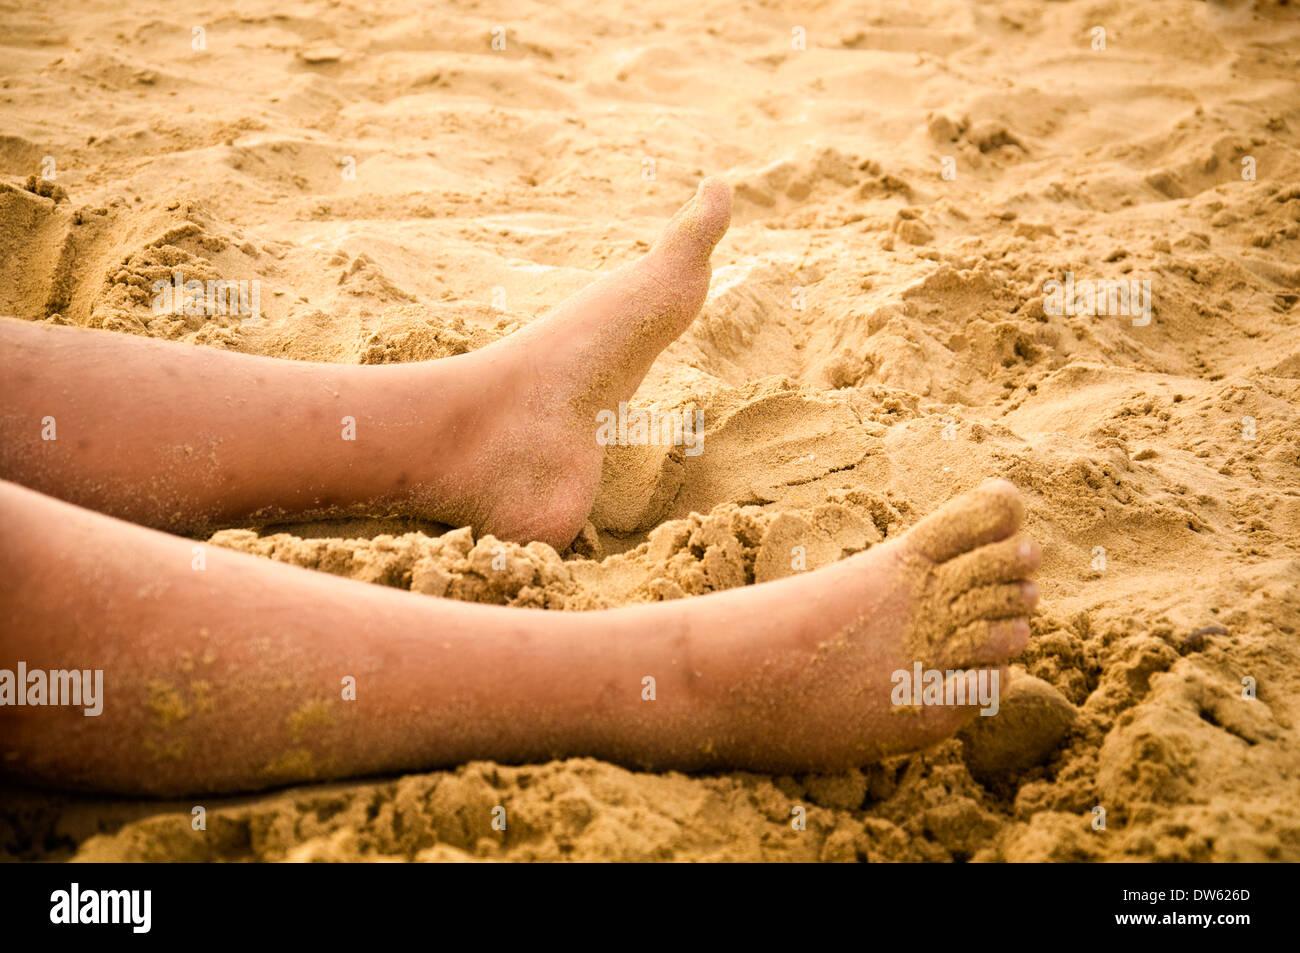 close up of feet on sandy beach - Stock Image